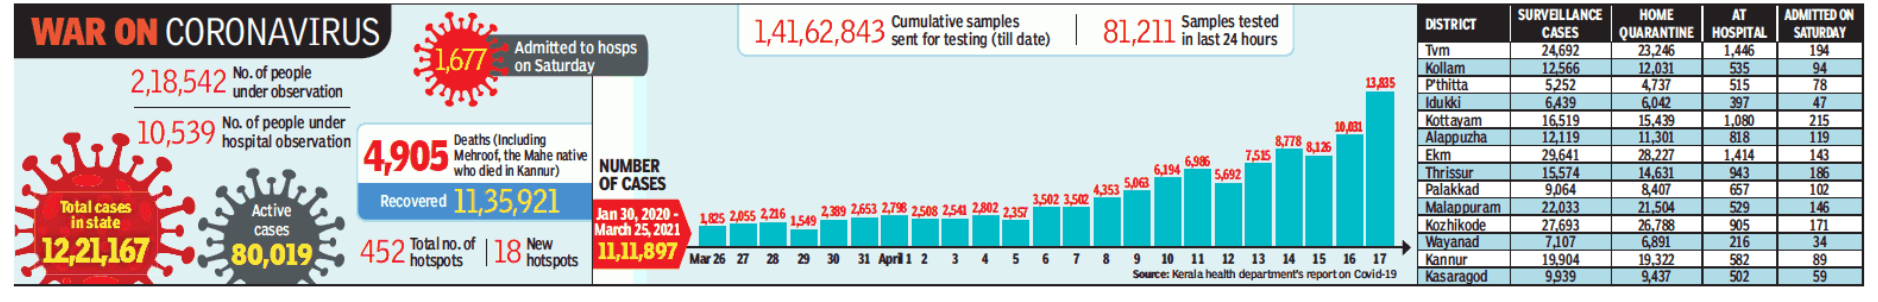 13,835 new Covid cases: Kerala's highest single-day spike so far